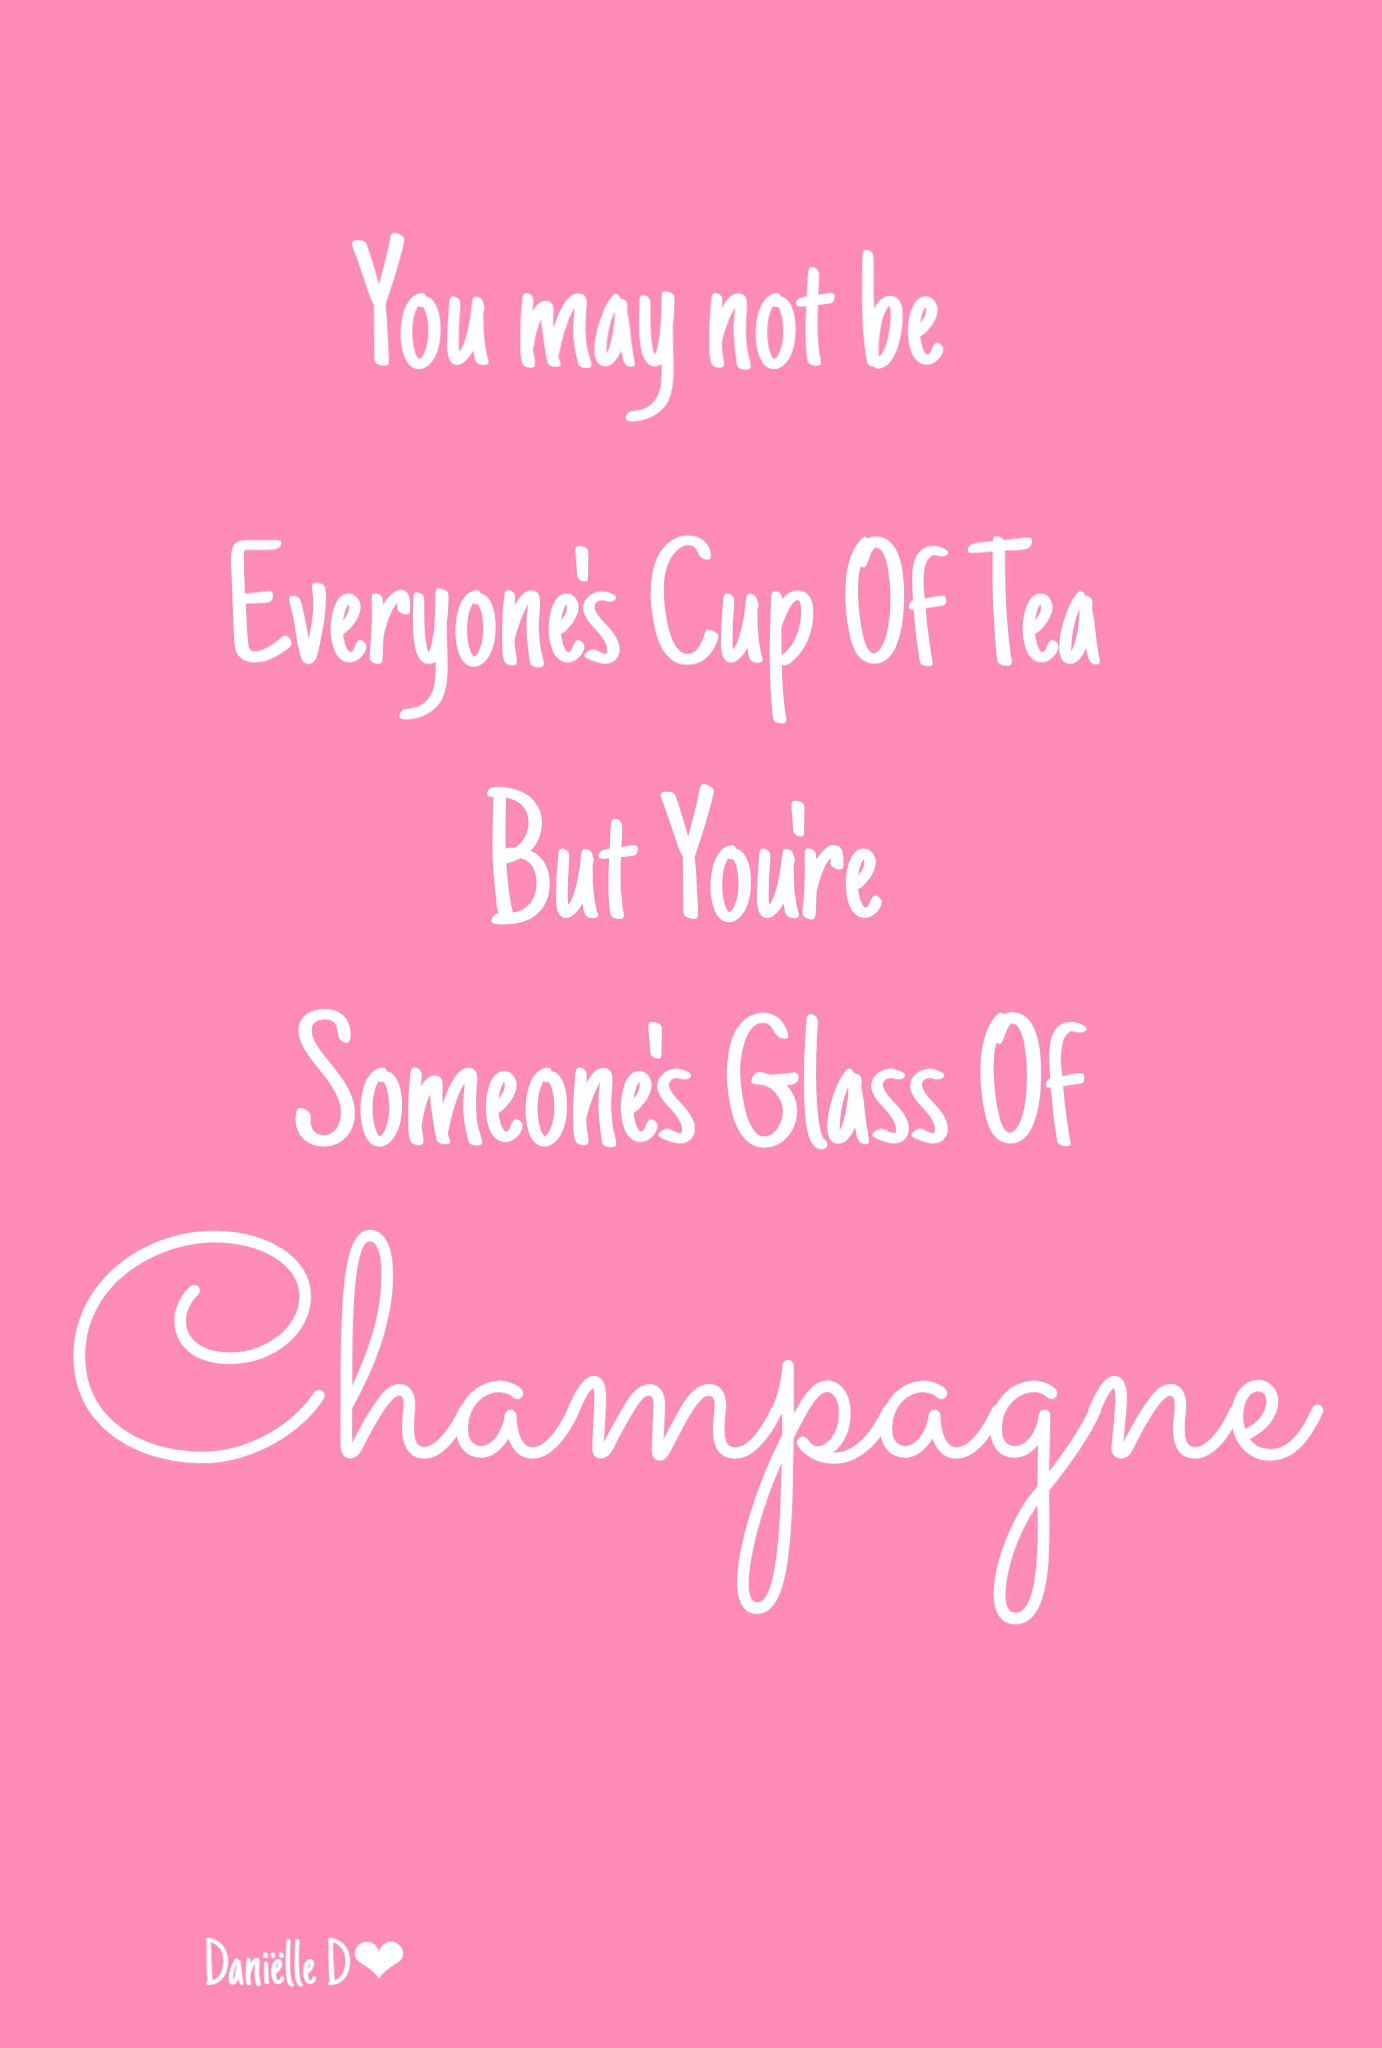 Champagne Inspirerande Citat Fina Ord Citat